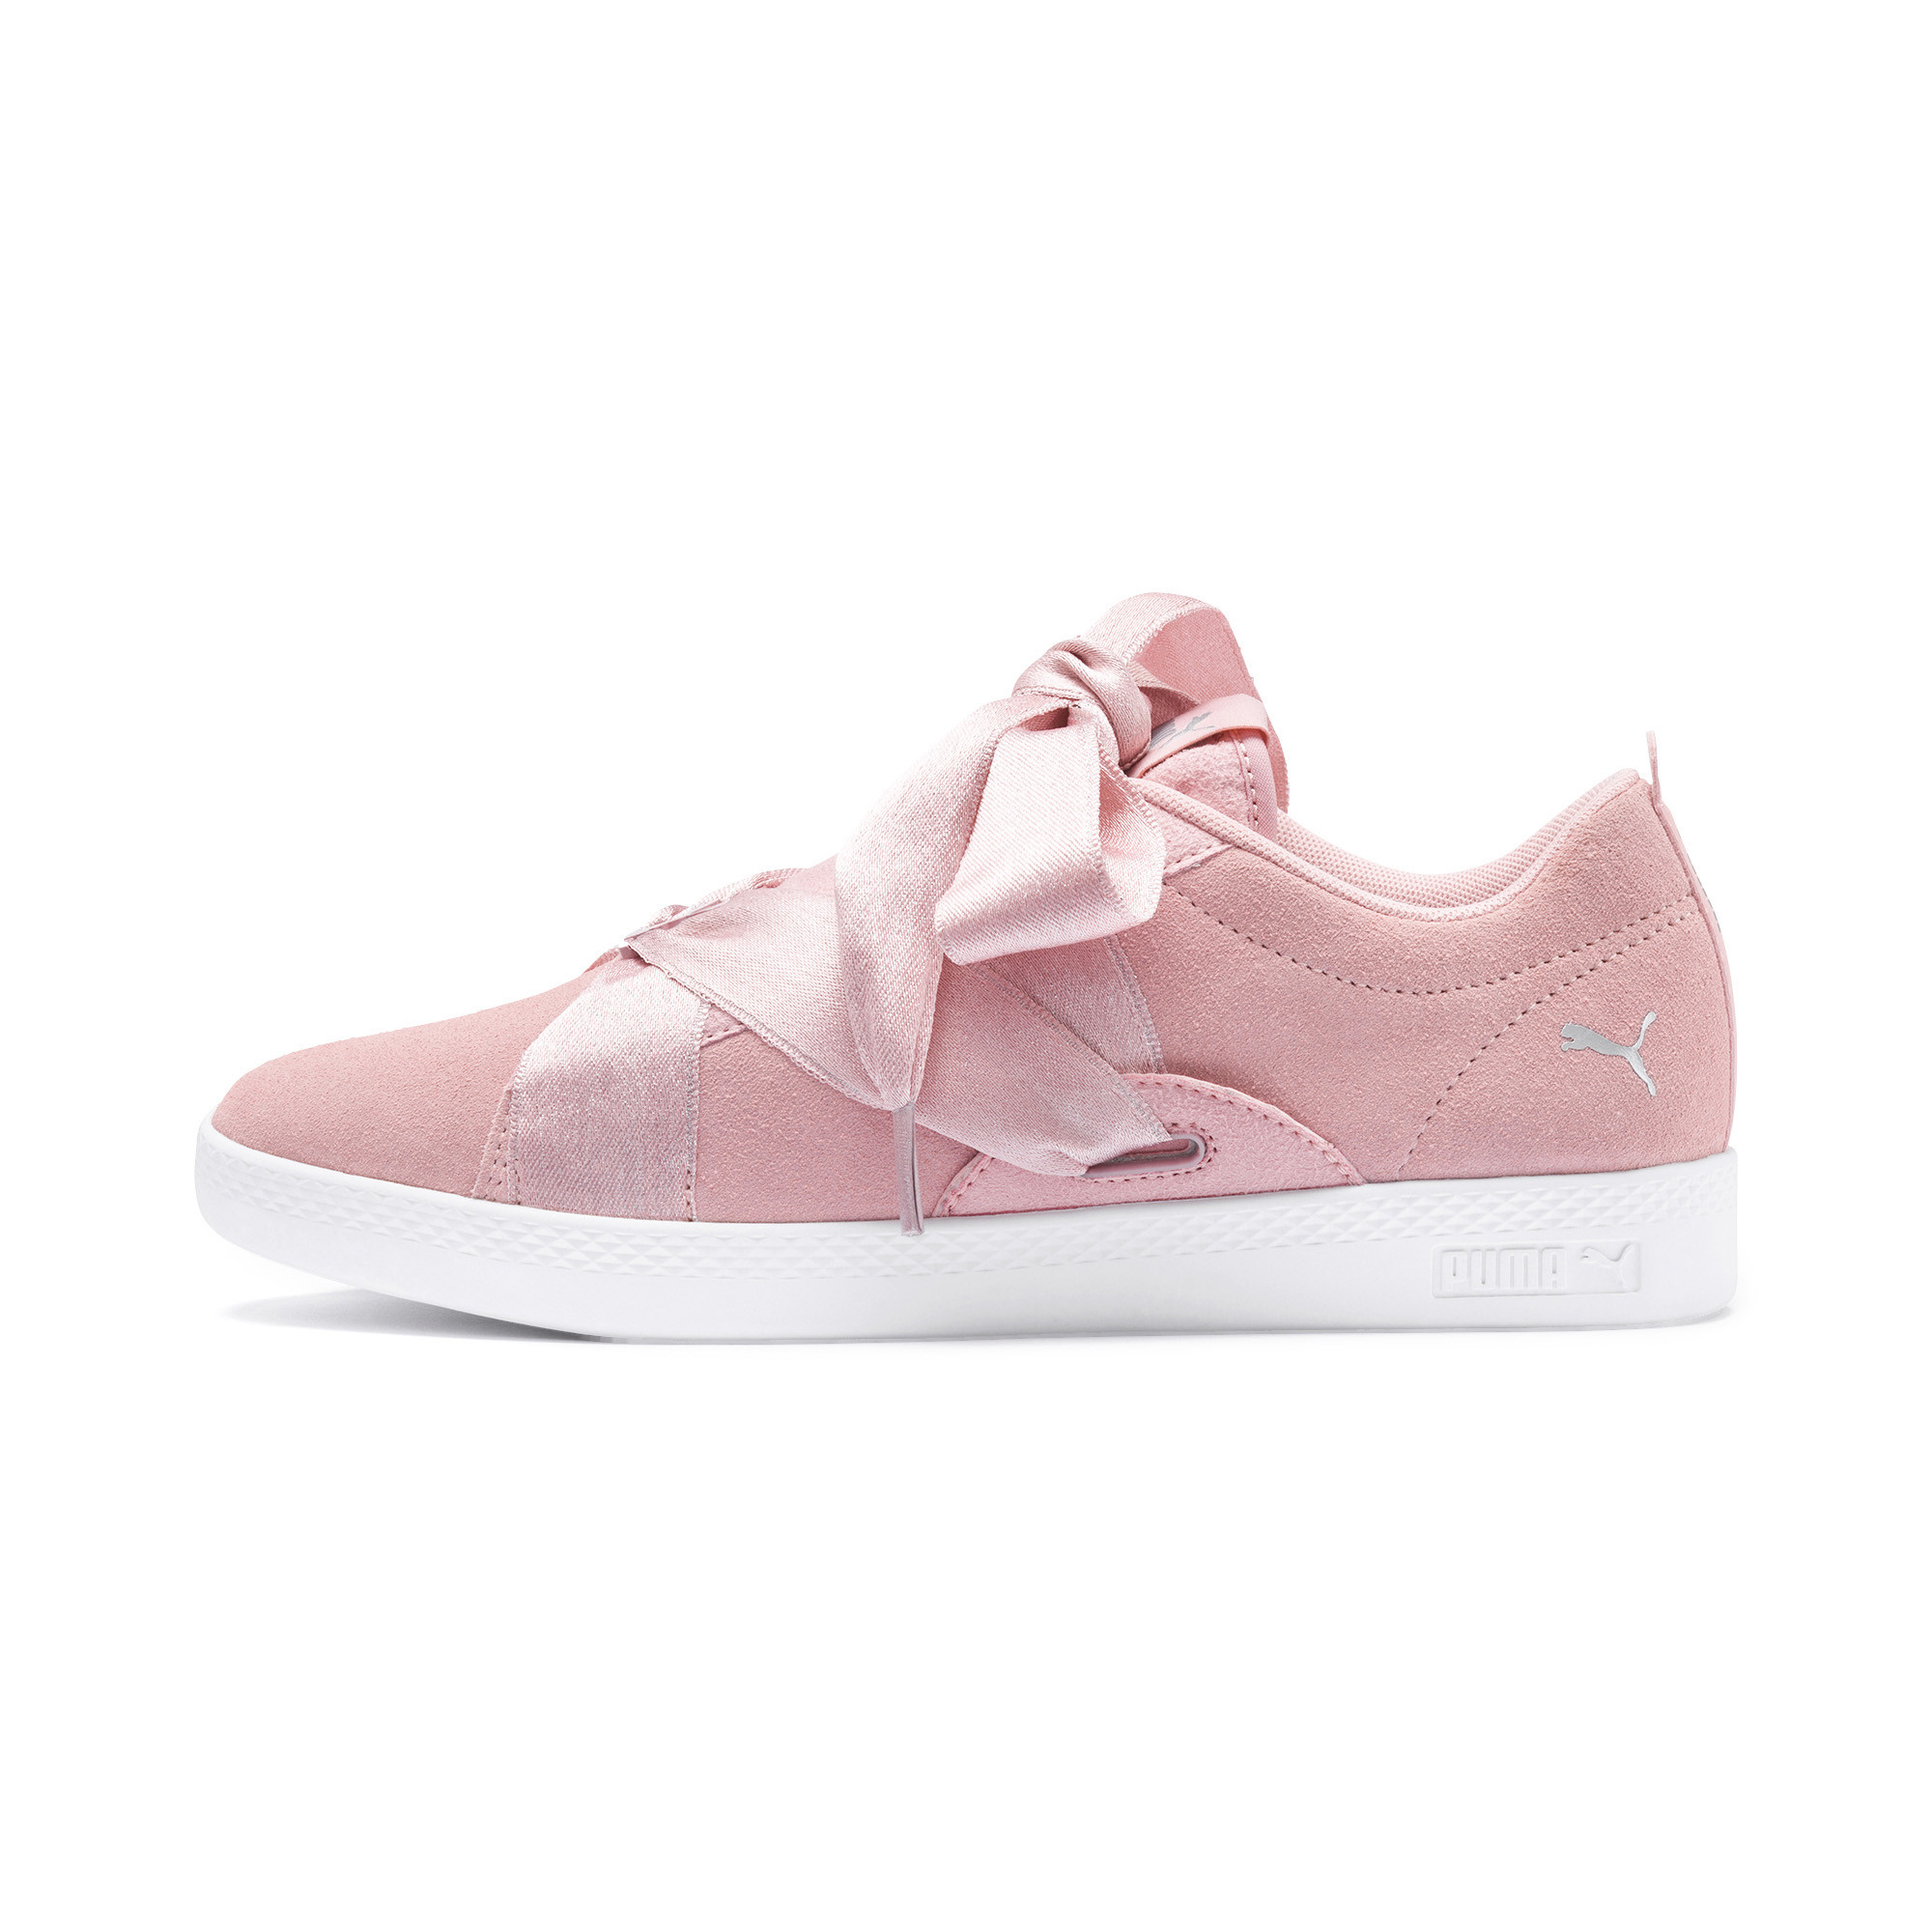 PUMA-PUMA-Smash-Astral-Buckle-Women-s-Sneakers-Women-Shoe-Basics thumbnail 4